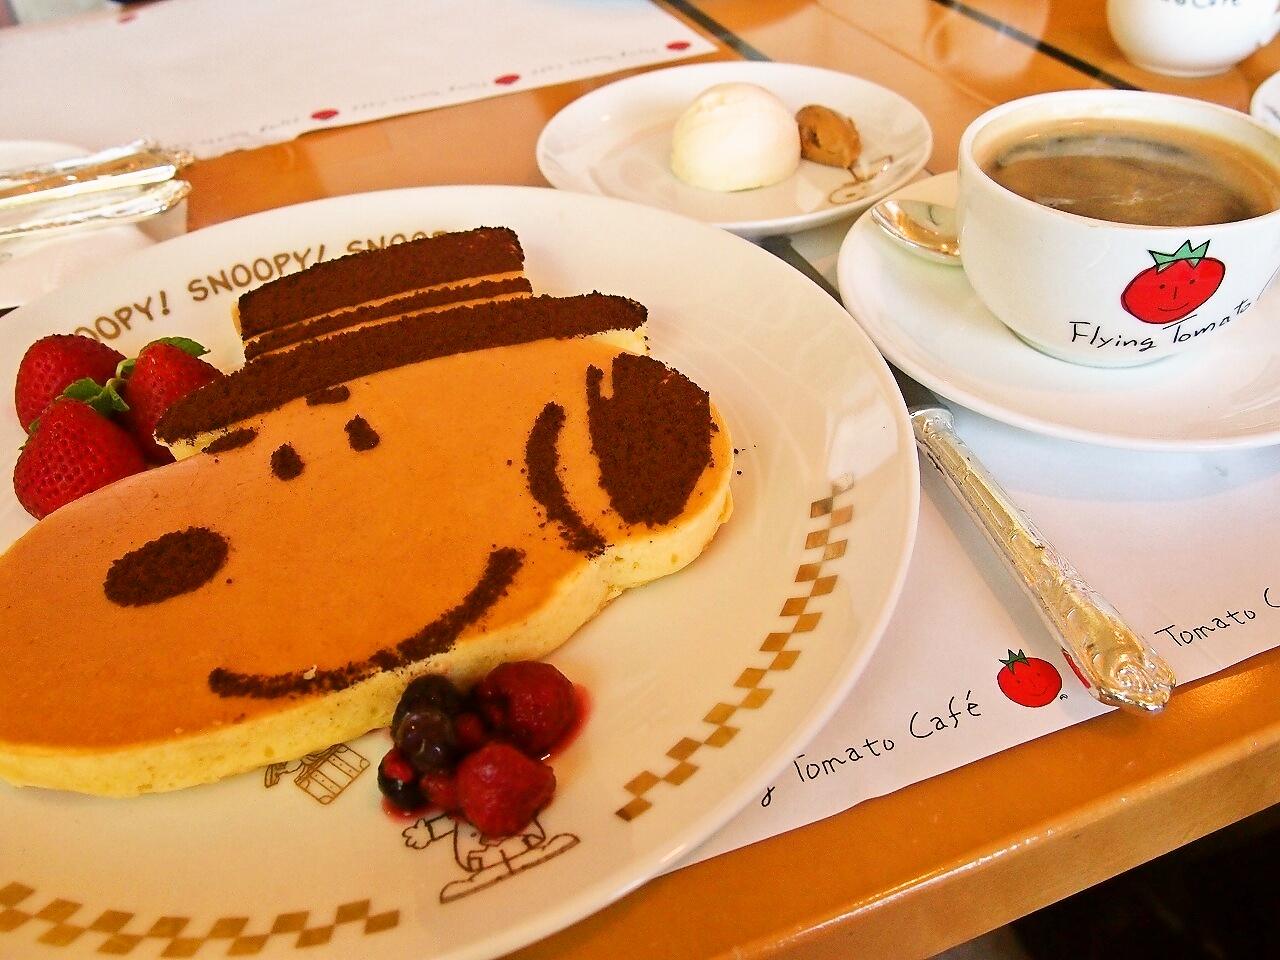 foodpic7821403.jpg